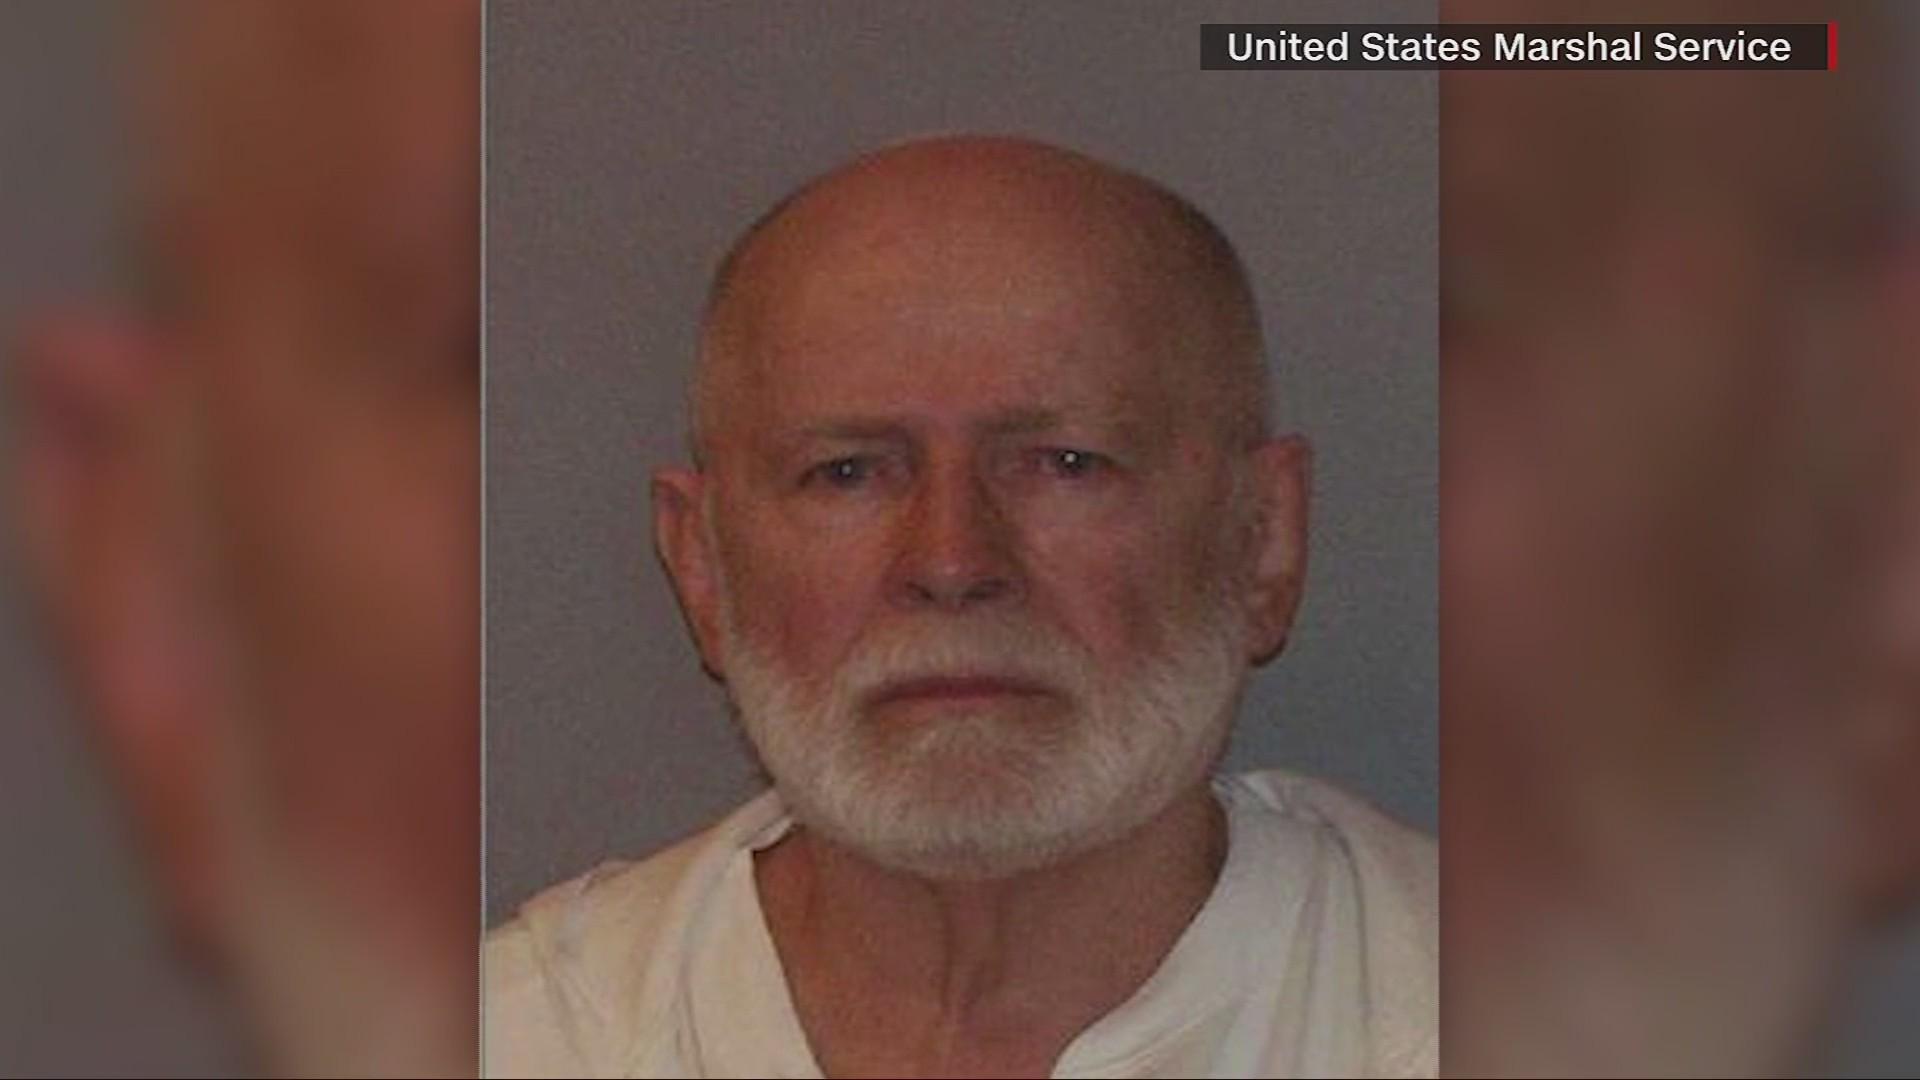 Whitey Bulger, Boston gangster, found dead in prison at 89